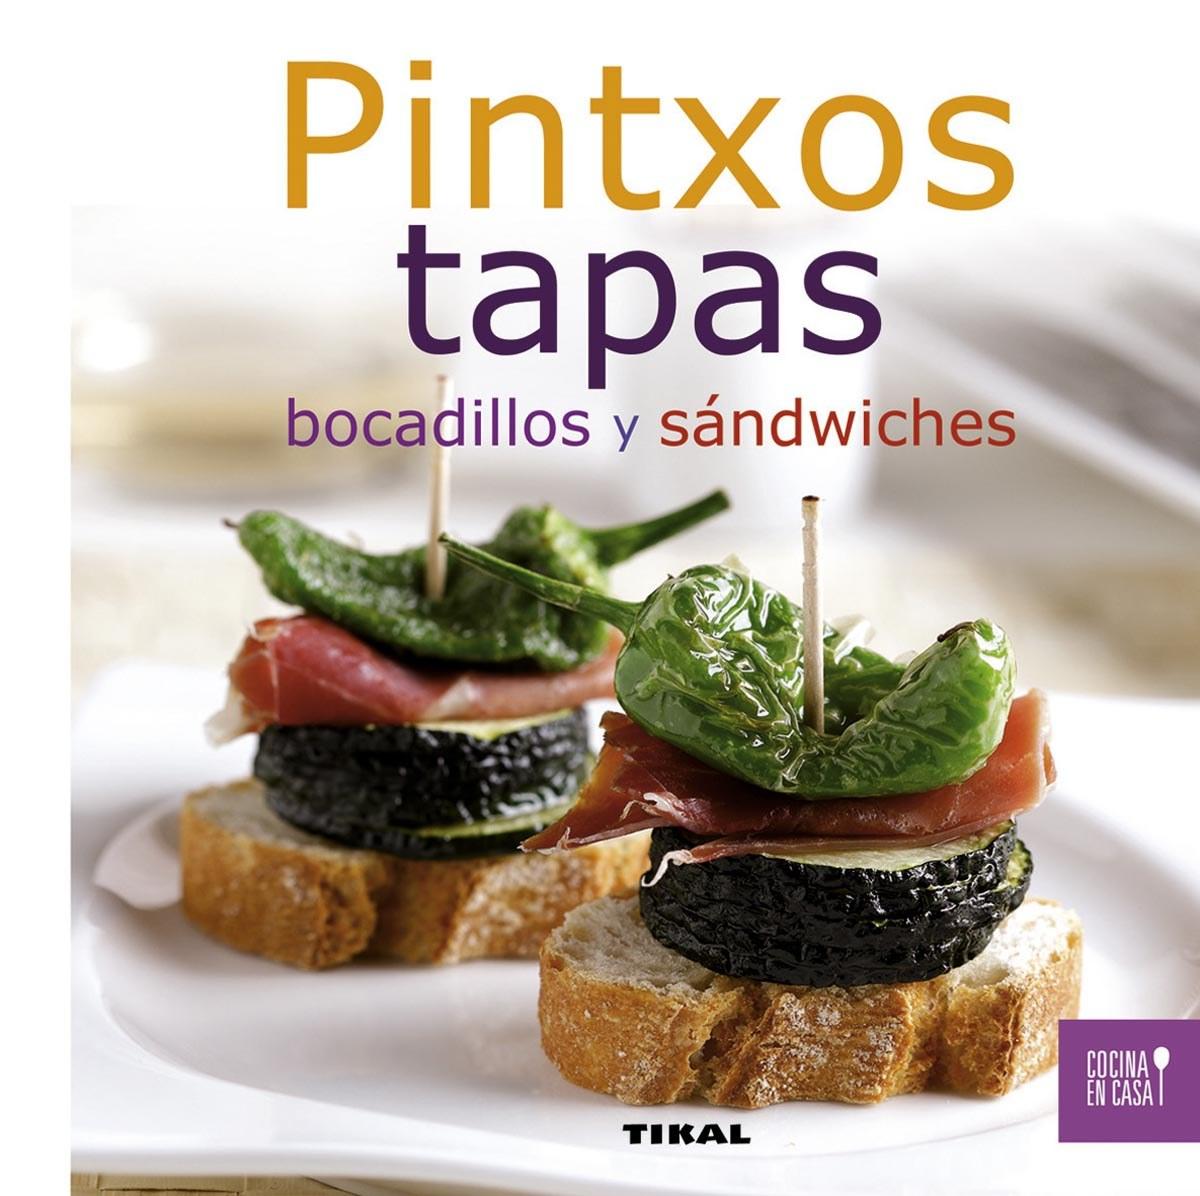 Pintxos, tapas, bocadillos y sandwiches 9788499281957